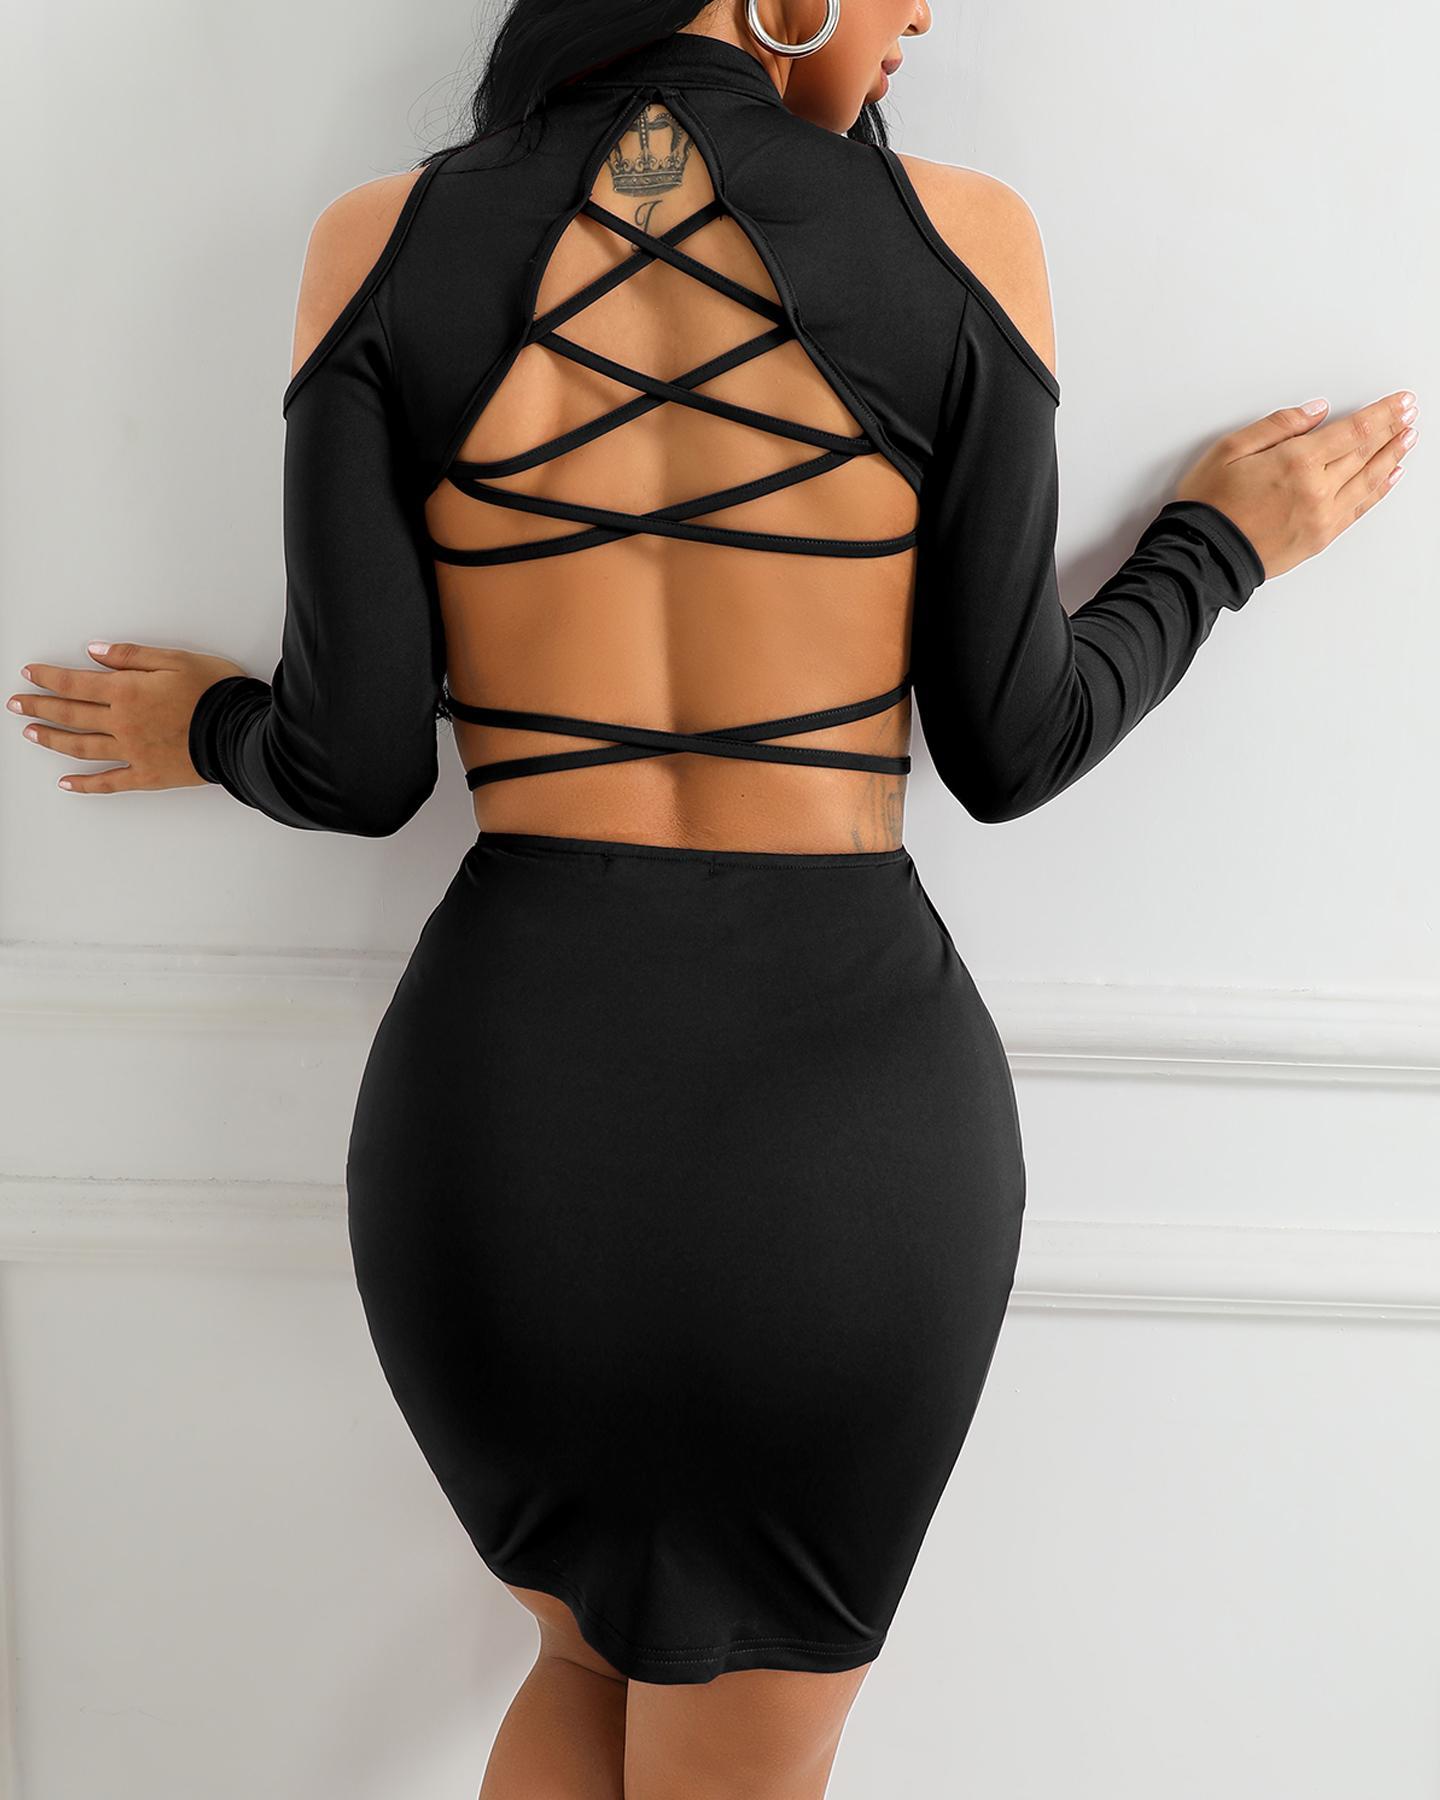 Lace-Up Back Zipper Design Bodycon Dress